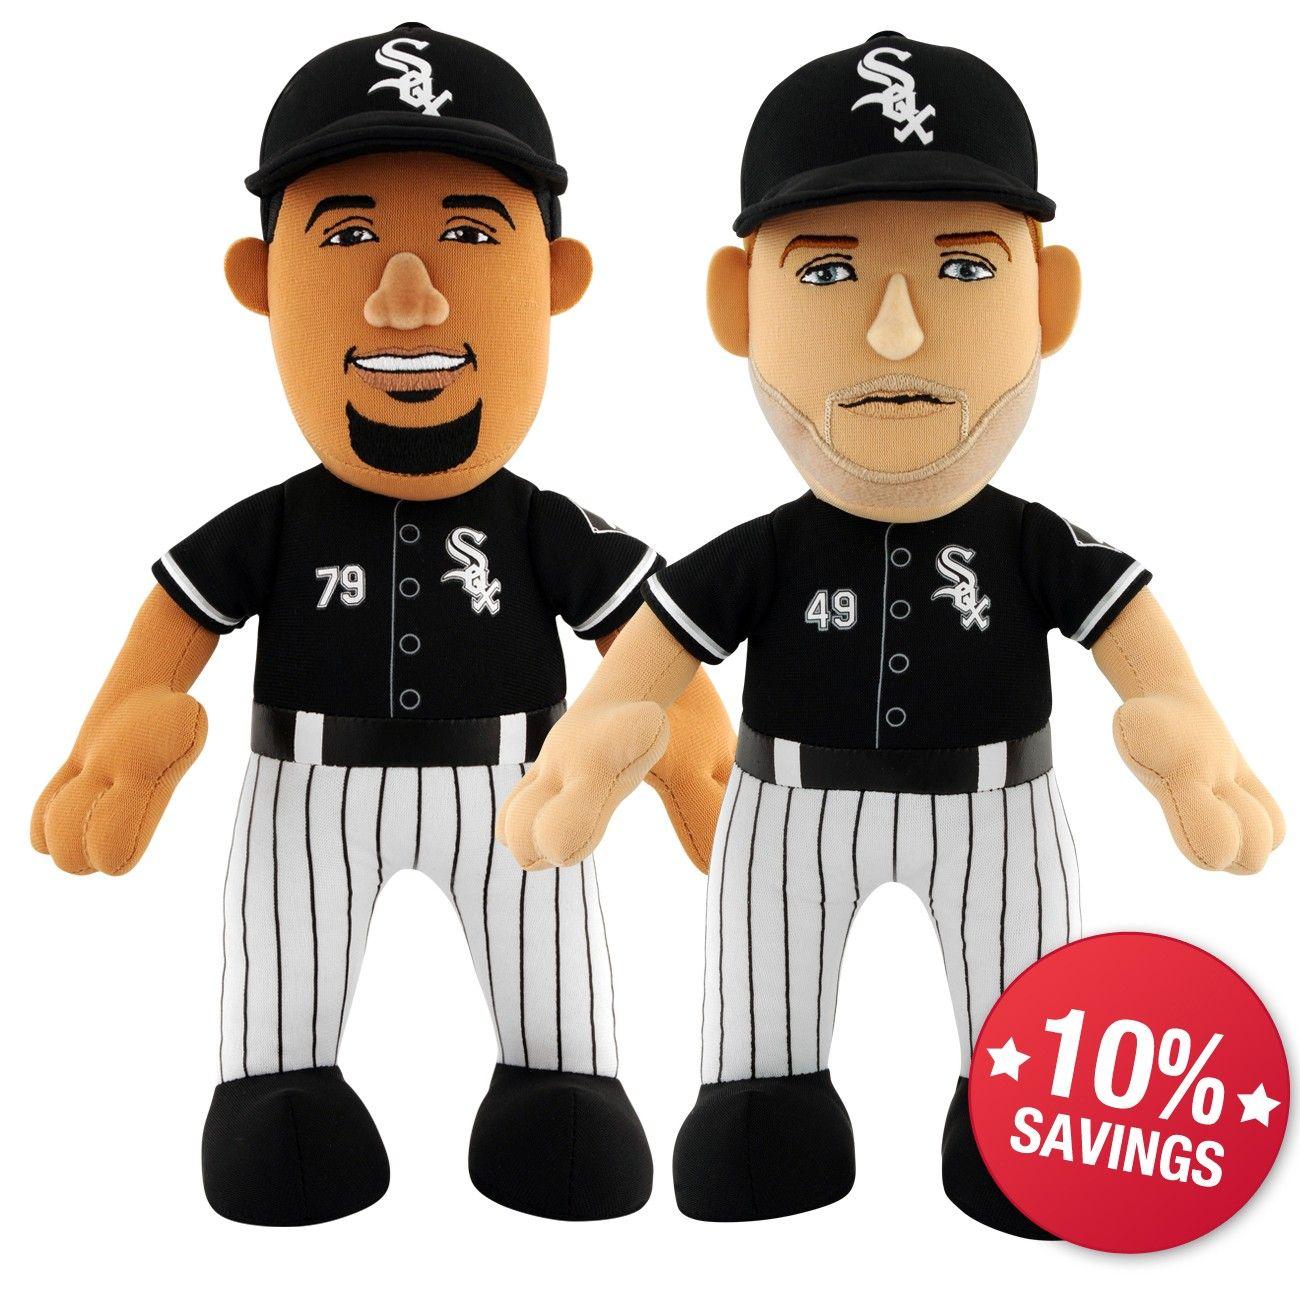 Chicago White Sox Dynamic Duo Bleacher Bundle (10% Savings!) - $35.99